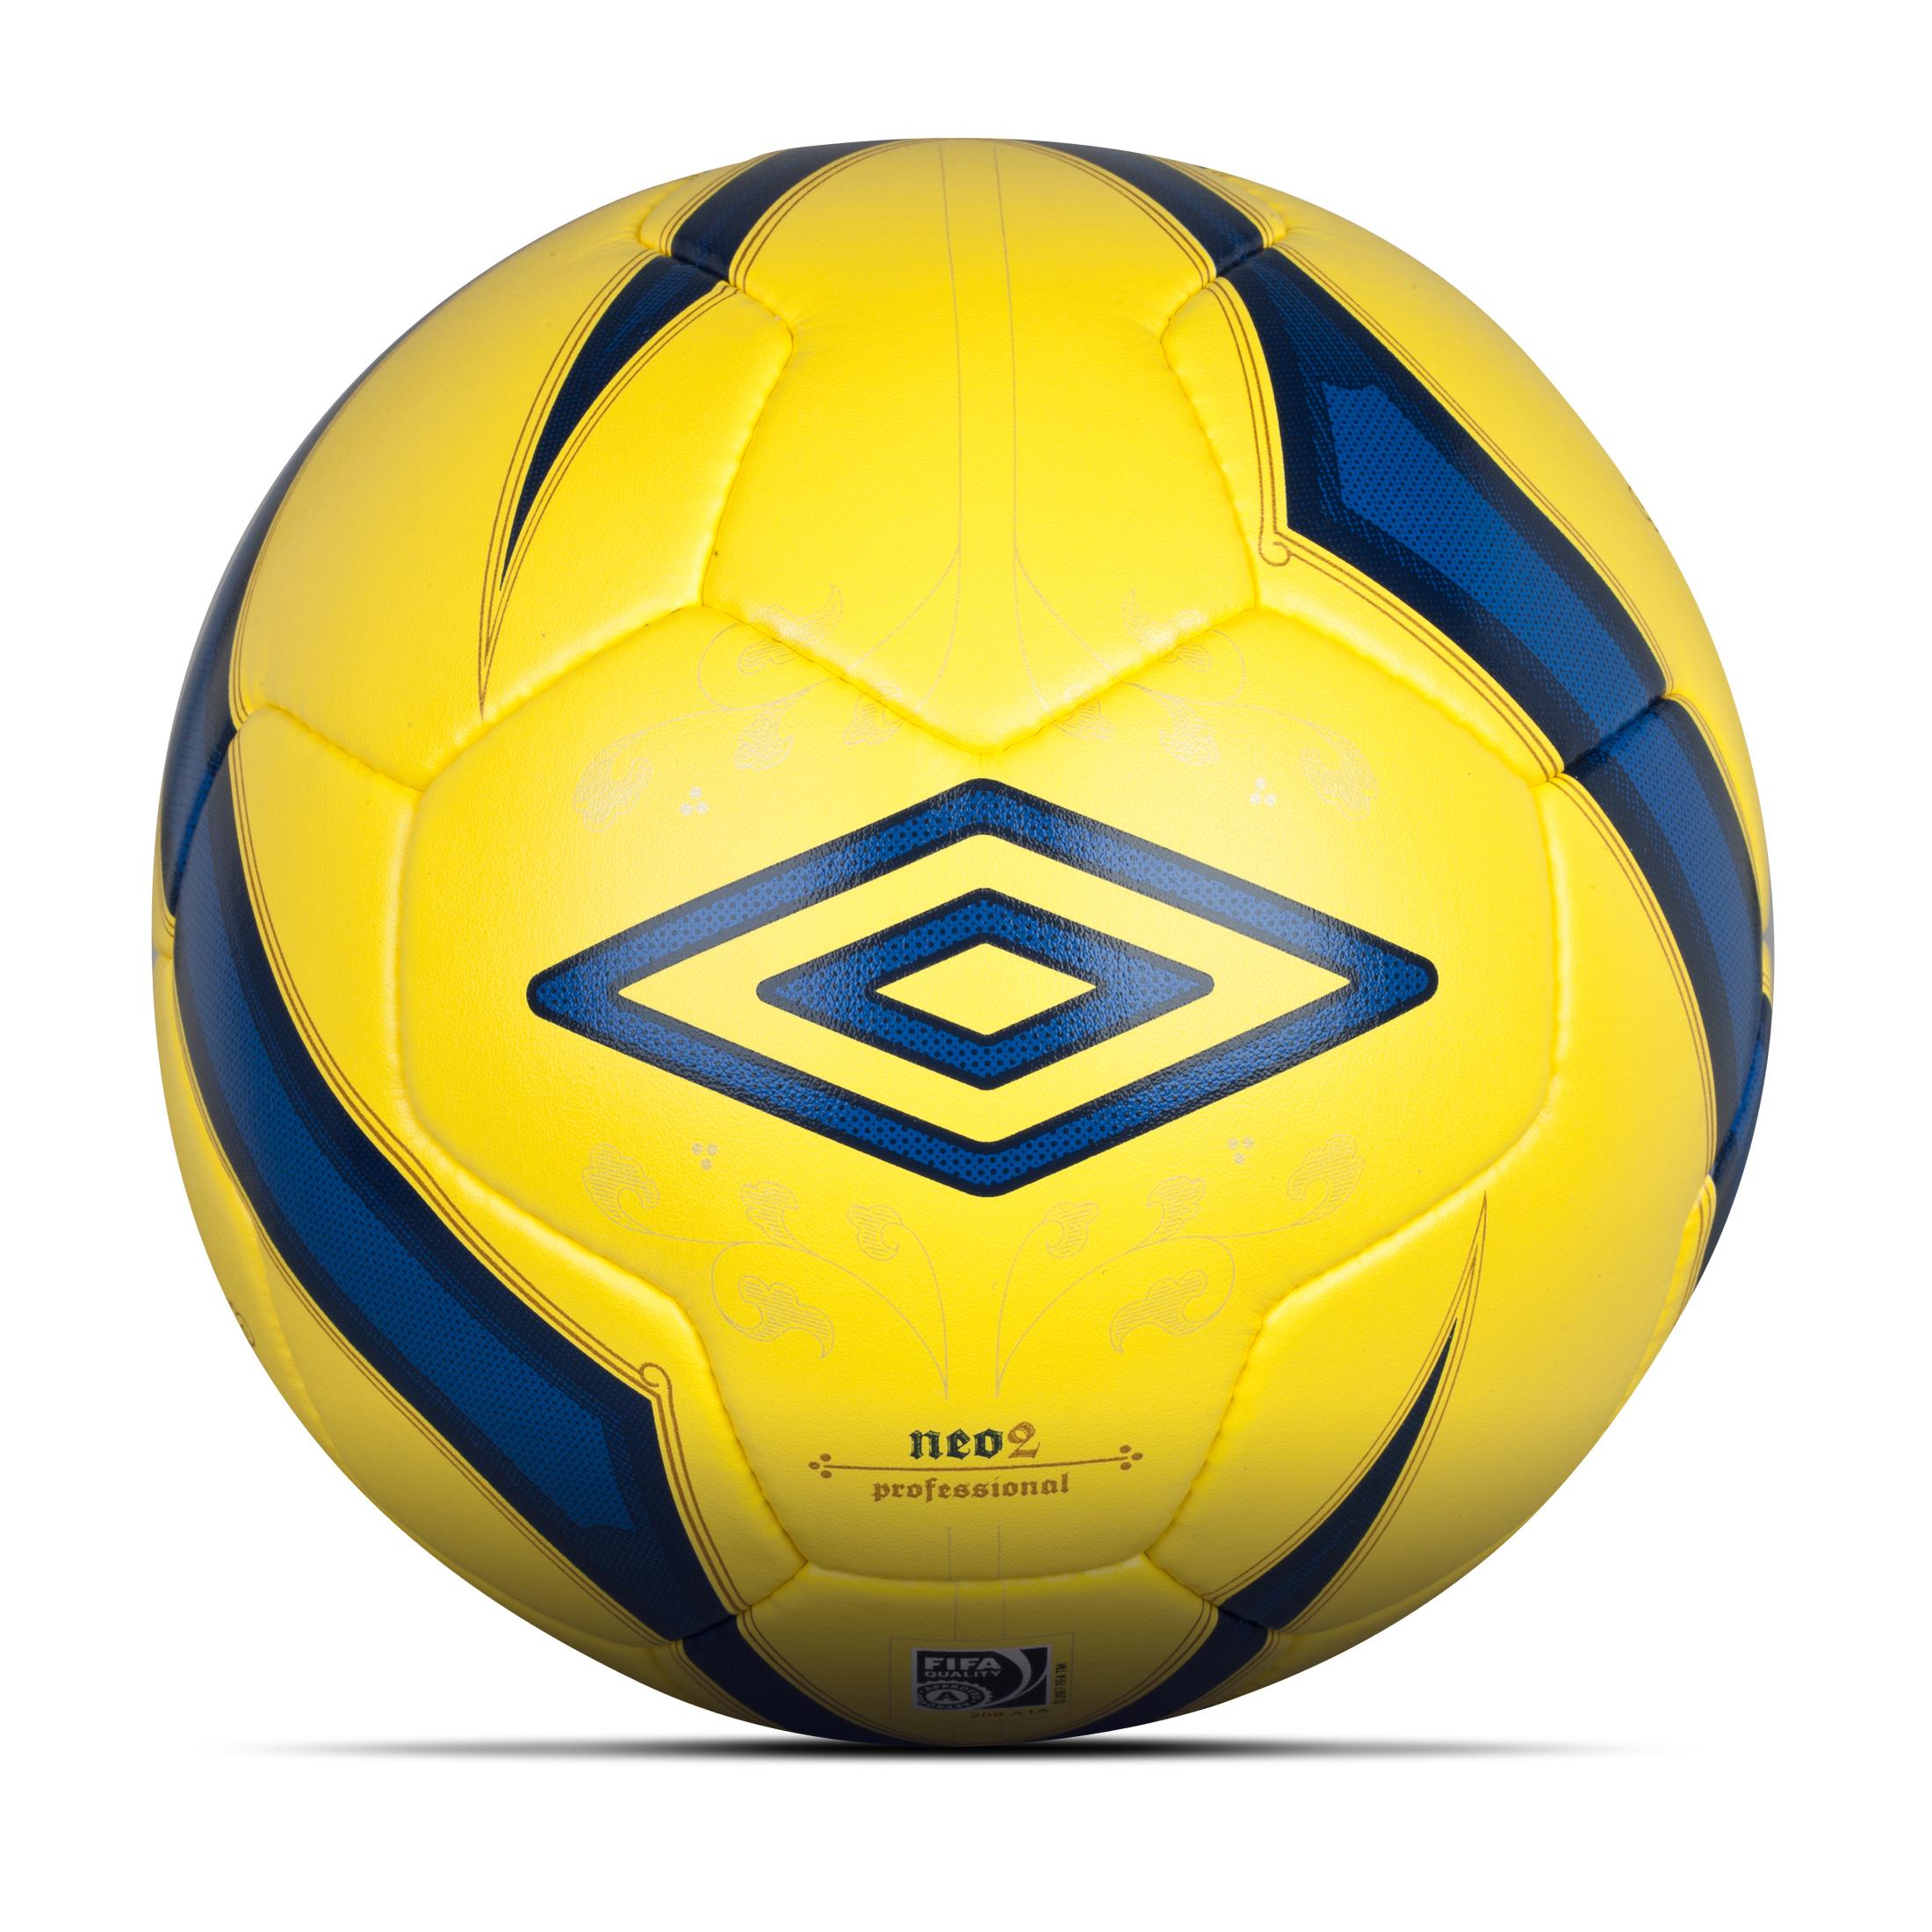 Umbro Neo 2 Pro Hi Vis Football-Yellow / Twilight Blue / Gold